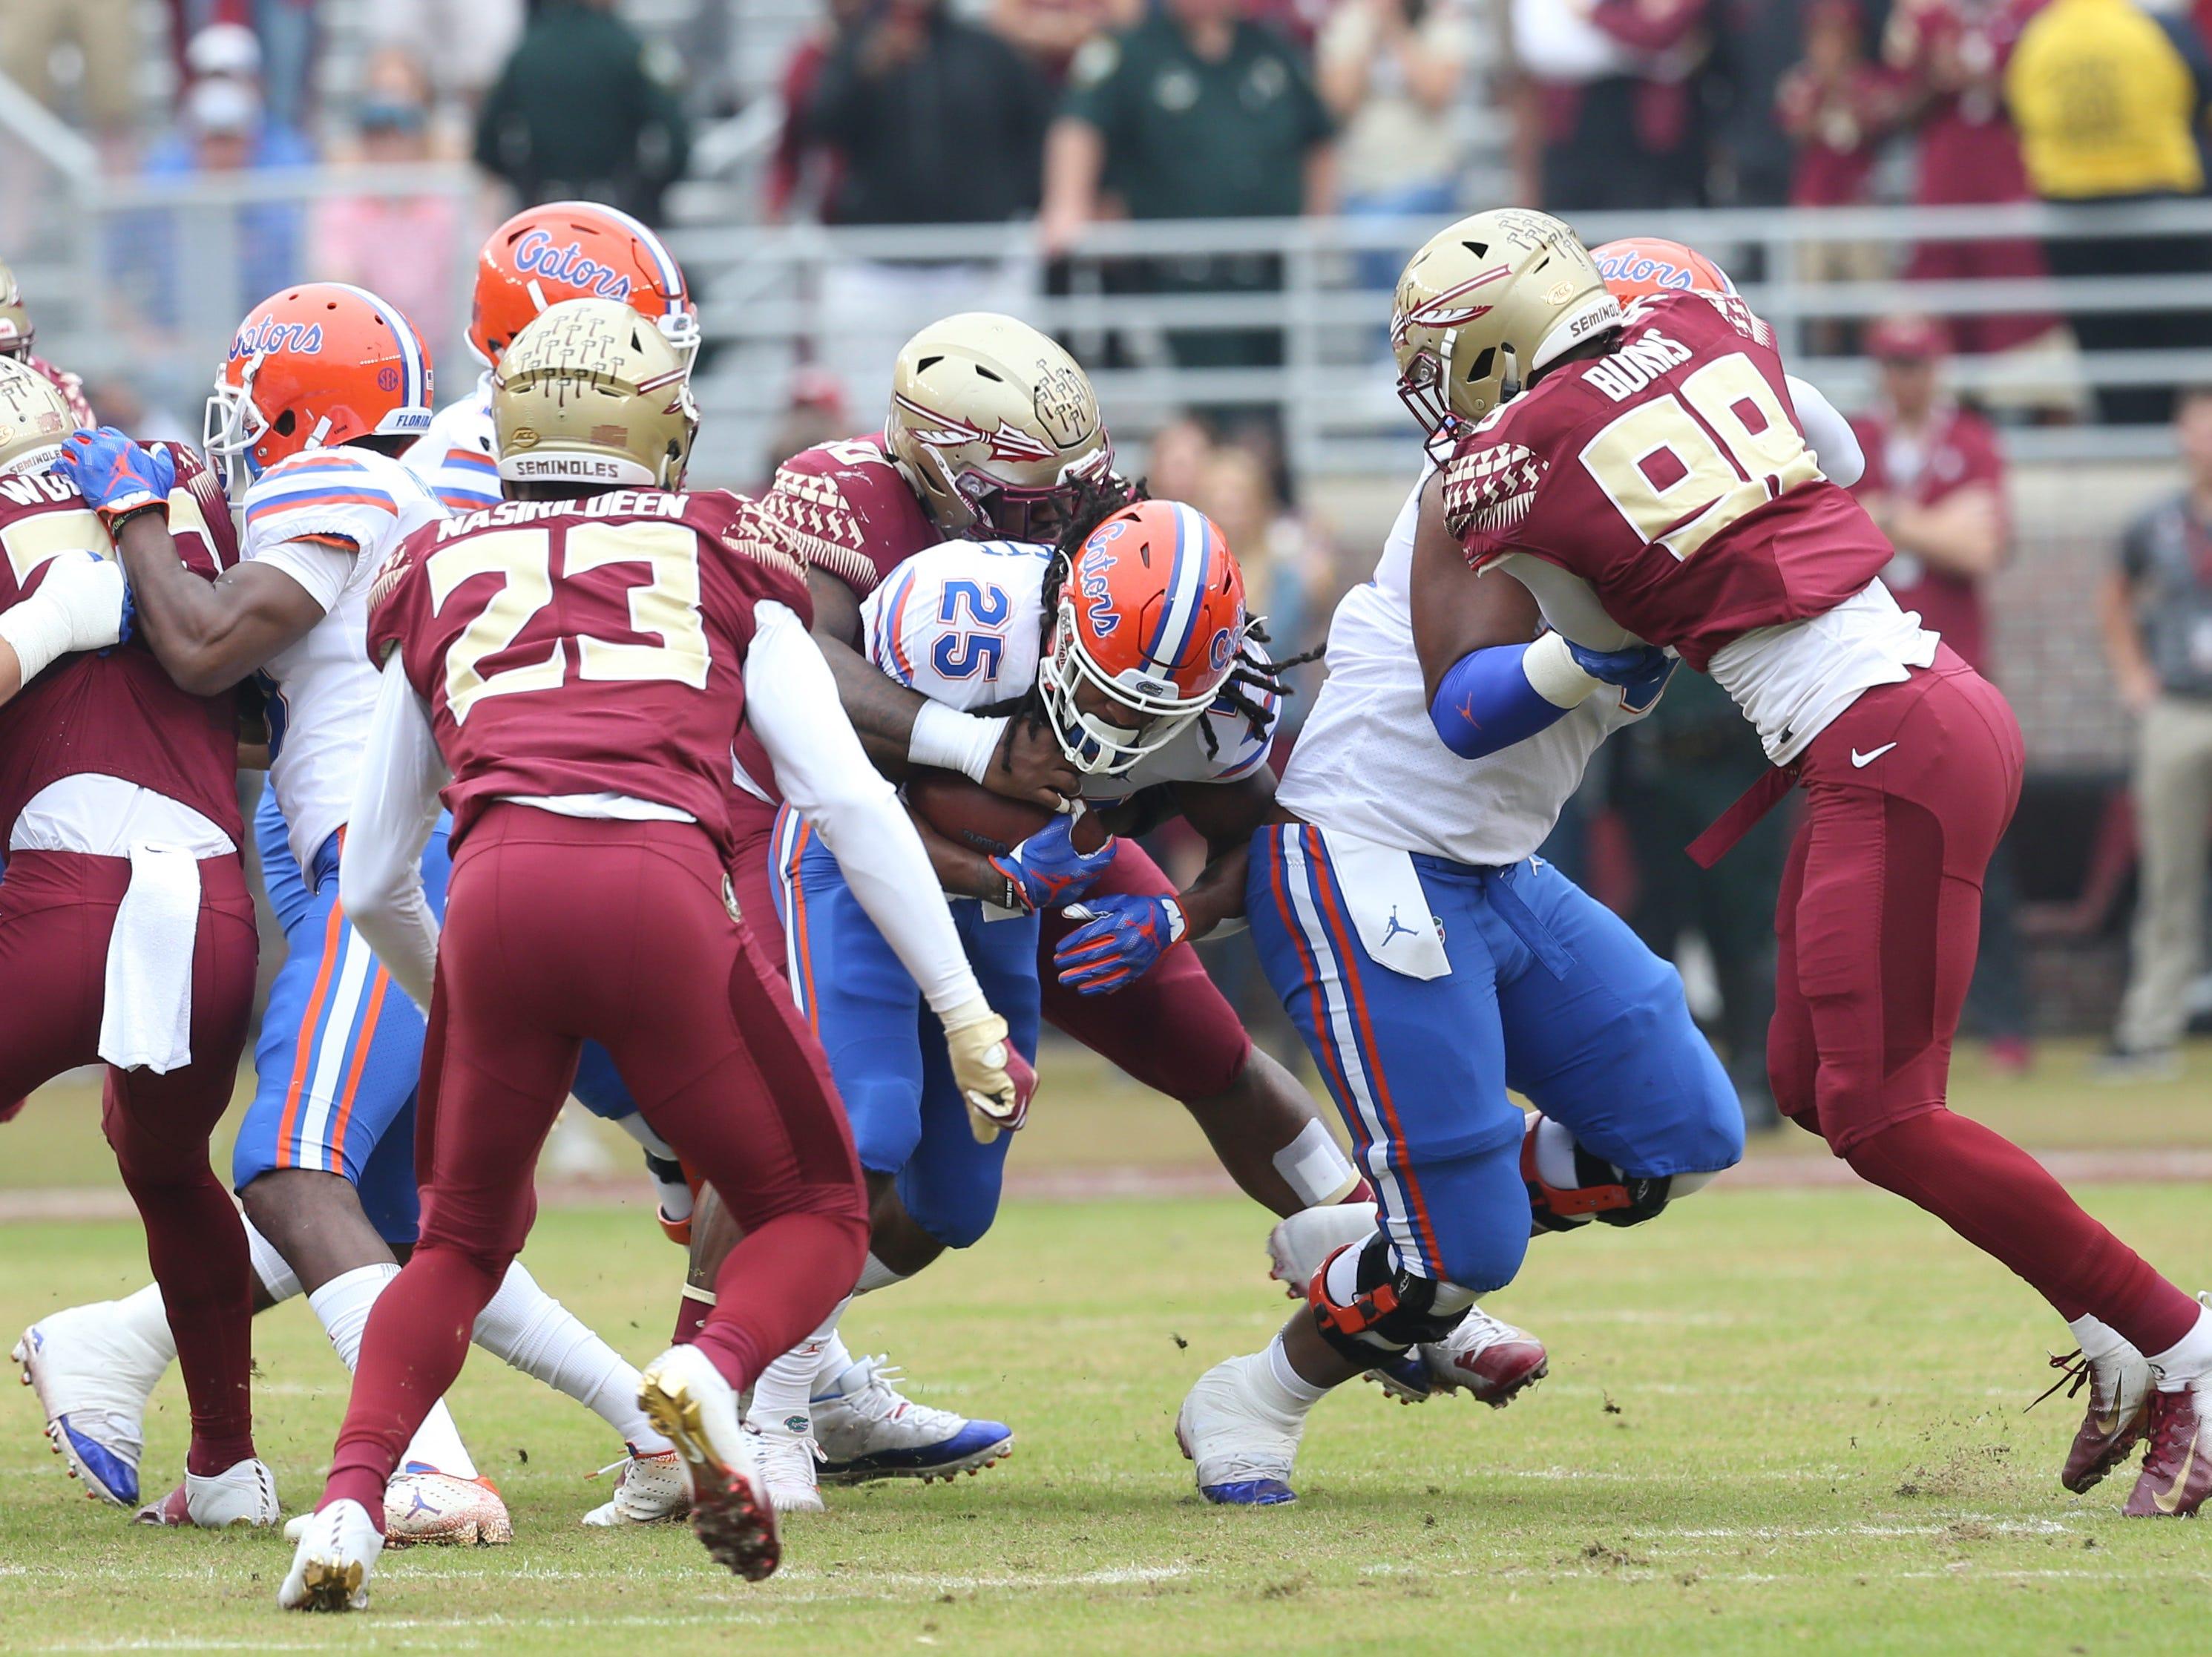 Florida Gators running back Jordan Scarlett (25) fights off the defense as the Florida State Seminoles take on their rival the Florida Gators in college football at Doak S. Campbell Stadium, Saturday, Nov. 24, 2018.